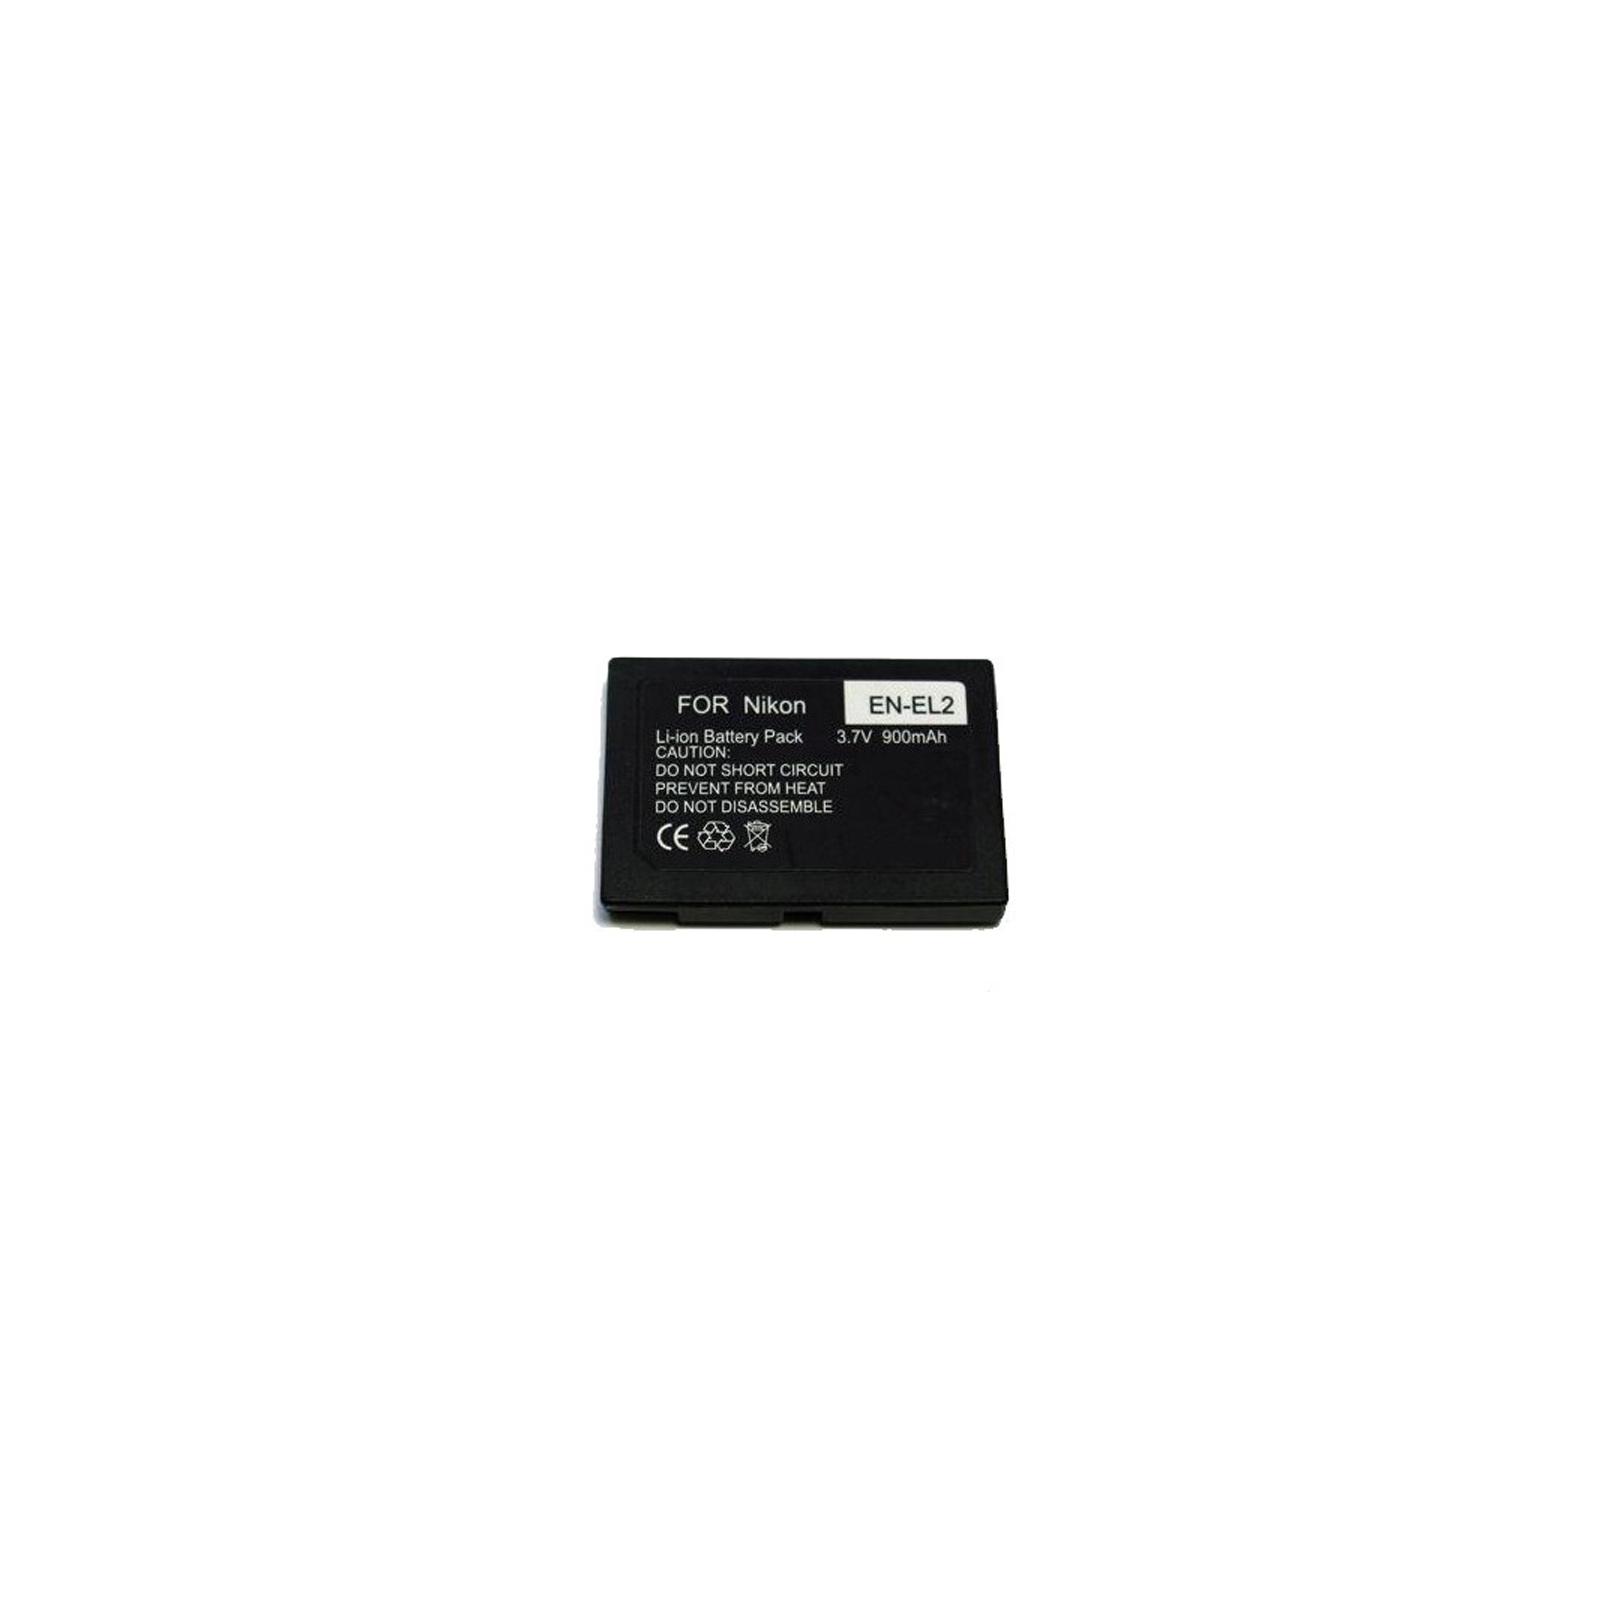 Аккумулятор к фото/видео EXTRADIGITAL Nikon EN-EL2 (DV00DV1037)